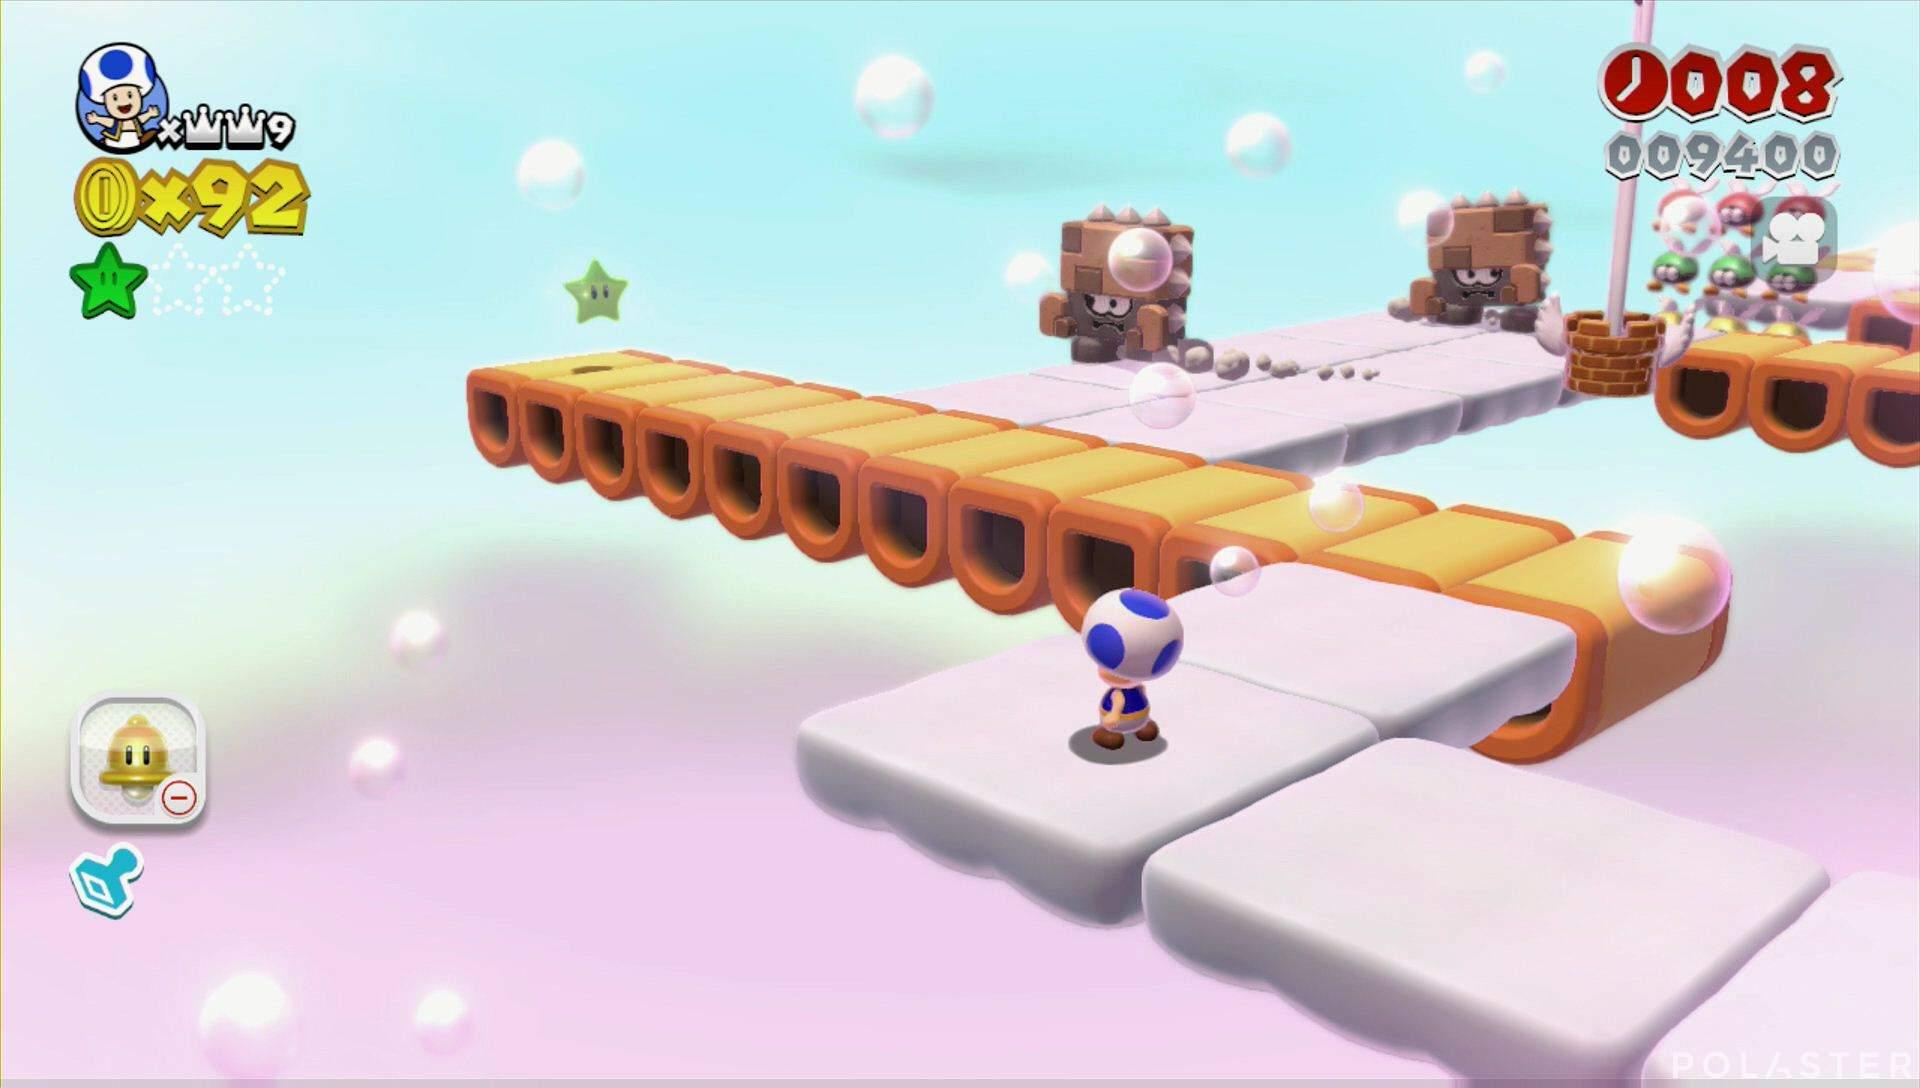 Super Mario 3D World Mundo Estrella-4 Estrella 2